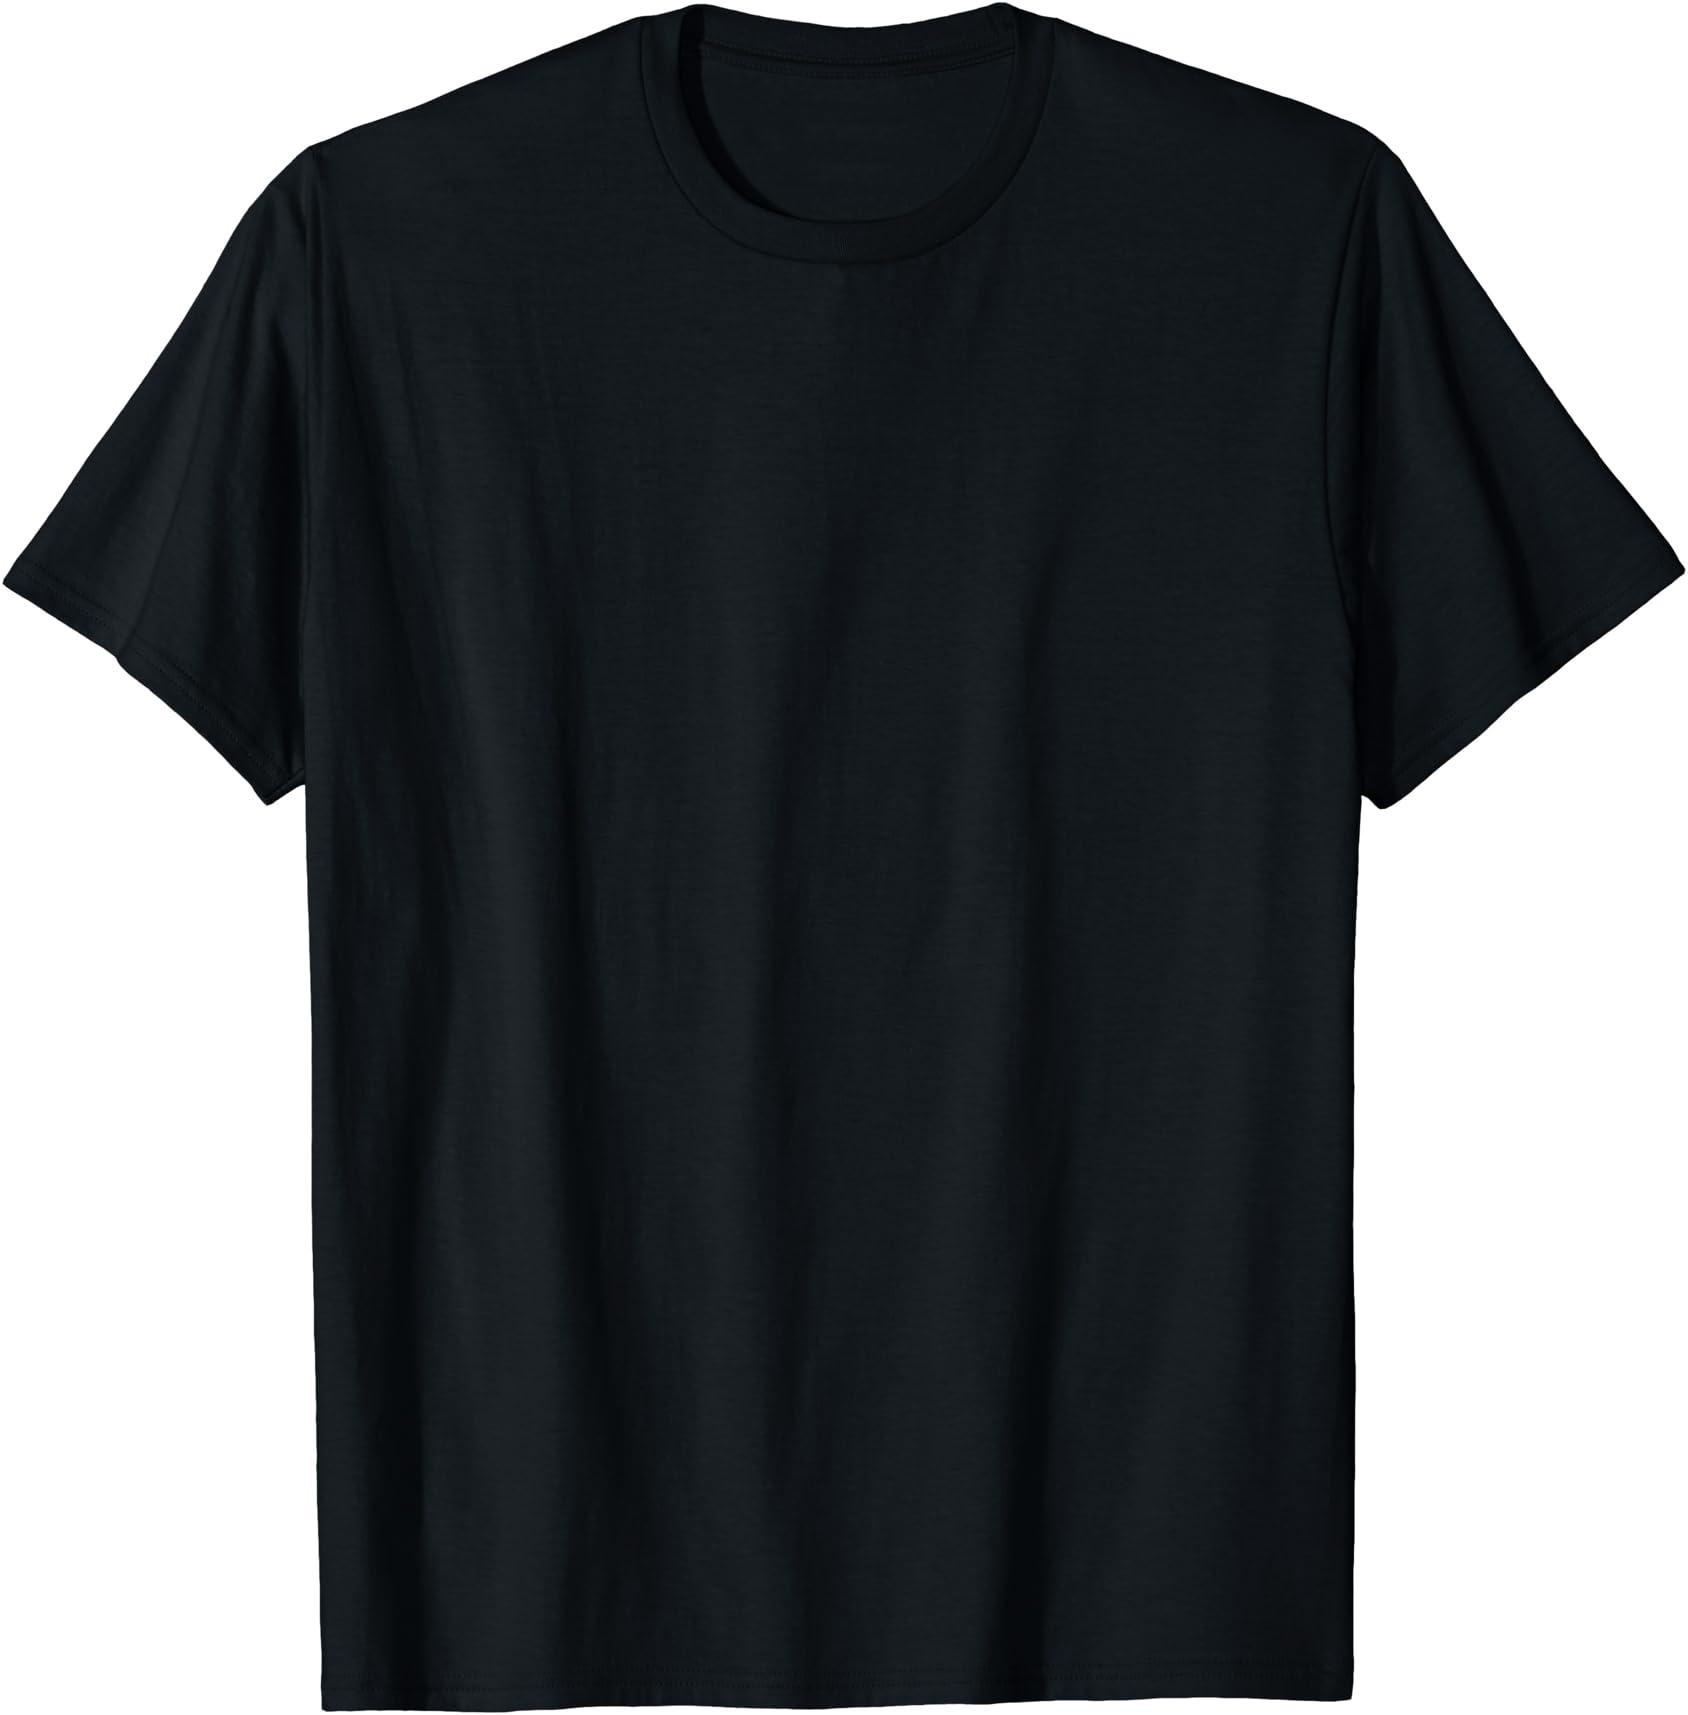 Eagle USA Youth Shirt Love USA Retro USA T shirt for Boys Girls 4th of July Gift